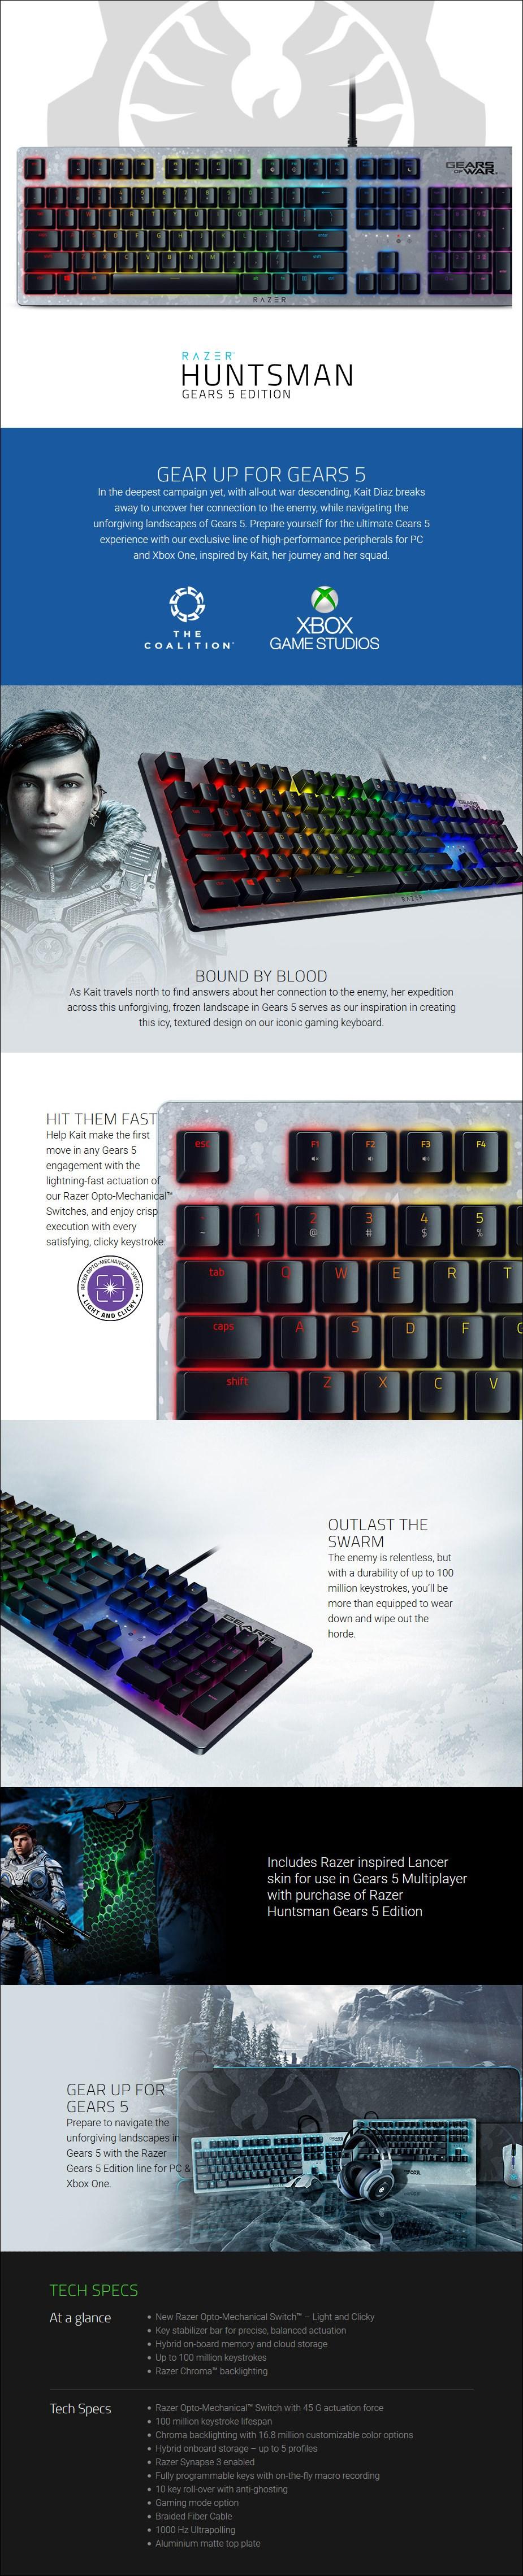 razer-huntsman-elaaite-optomechanical-gaming-keyboard-gears-5-edition-ac29132-6.jpg